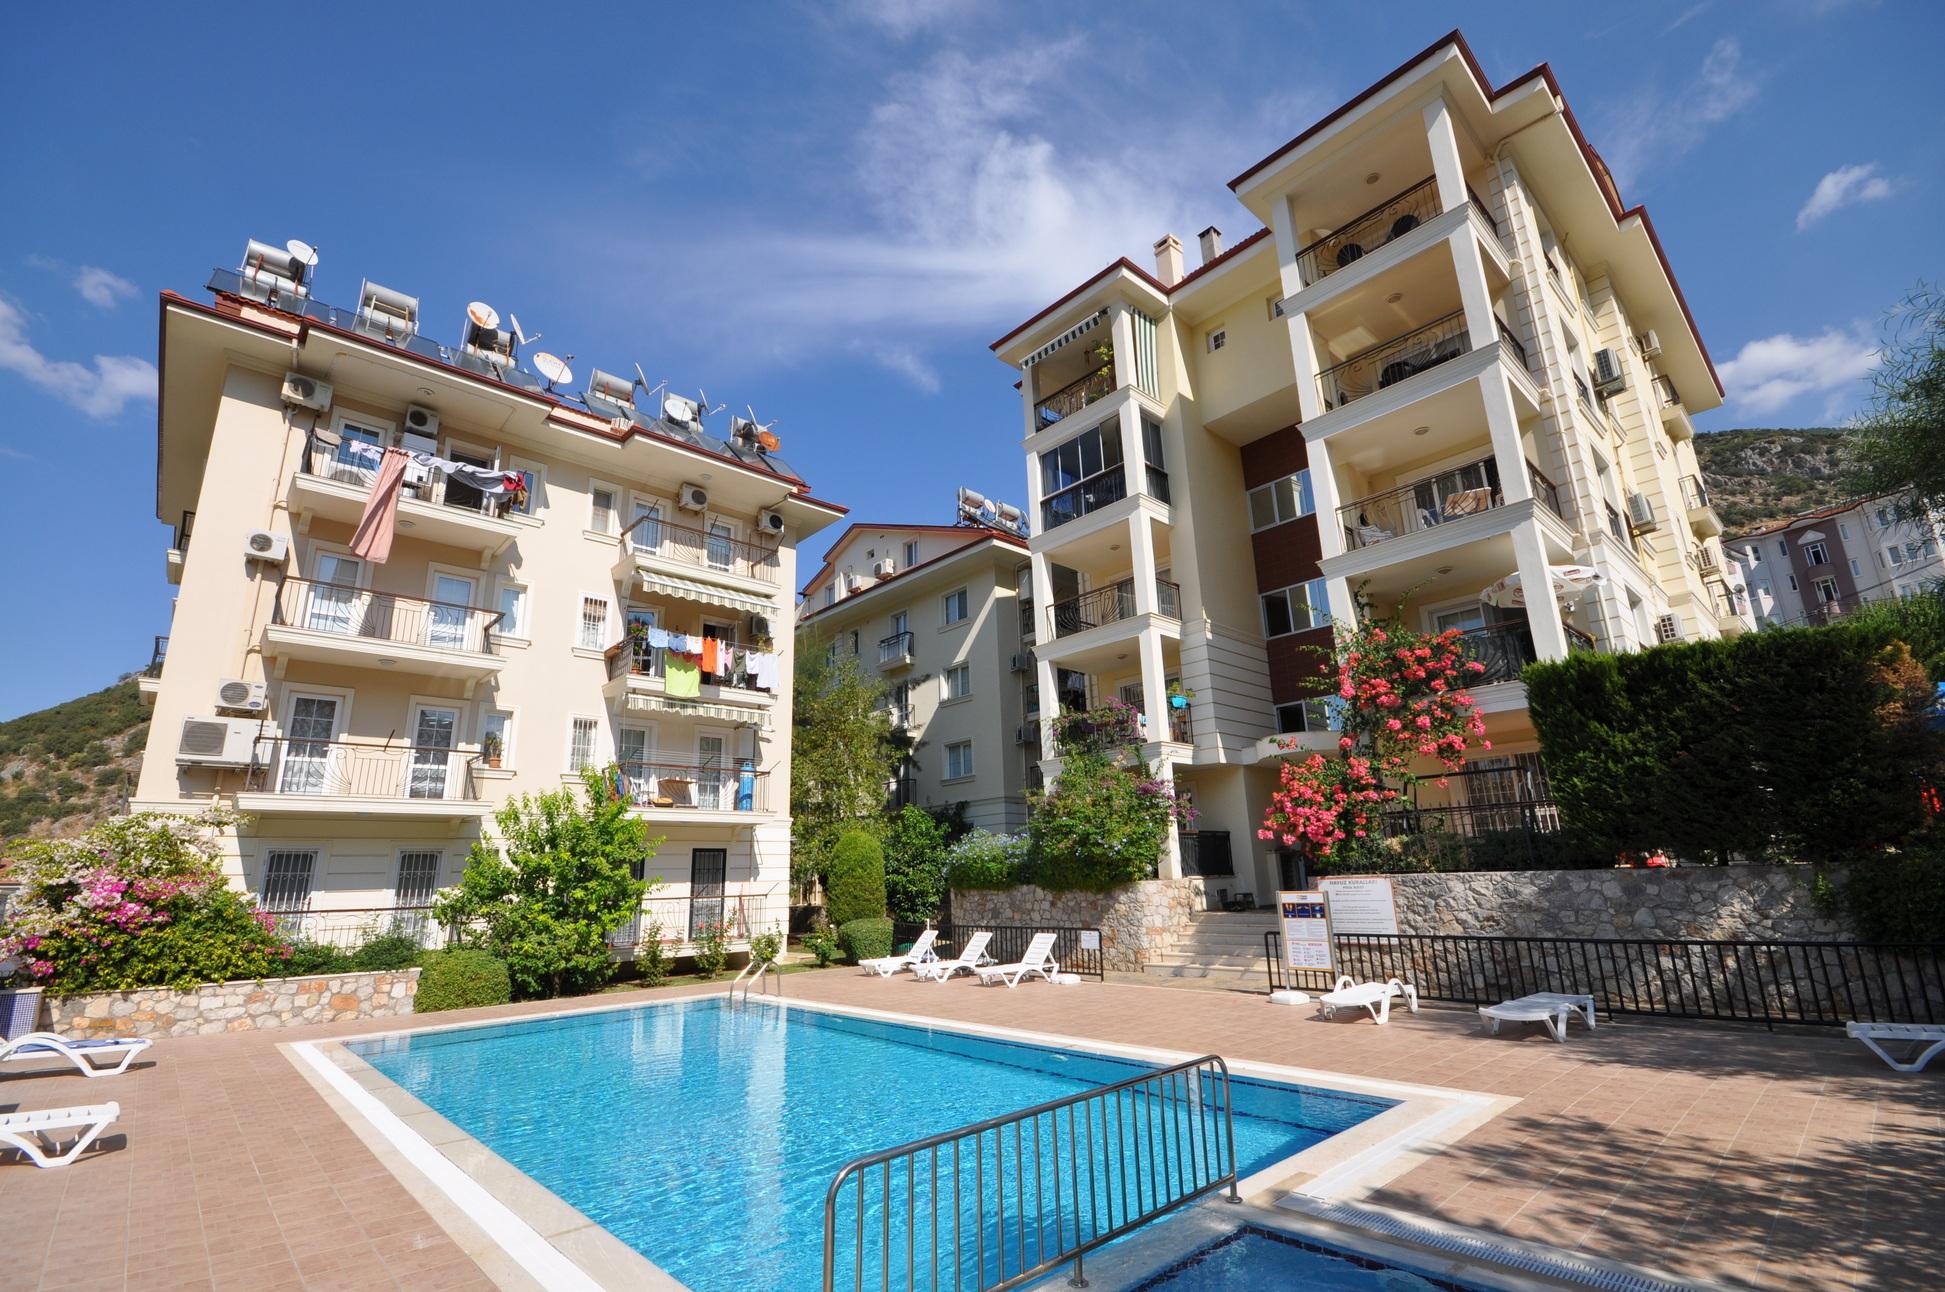 4 Bedroom Resale Duplex Apartment with City & Sea Views